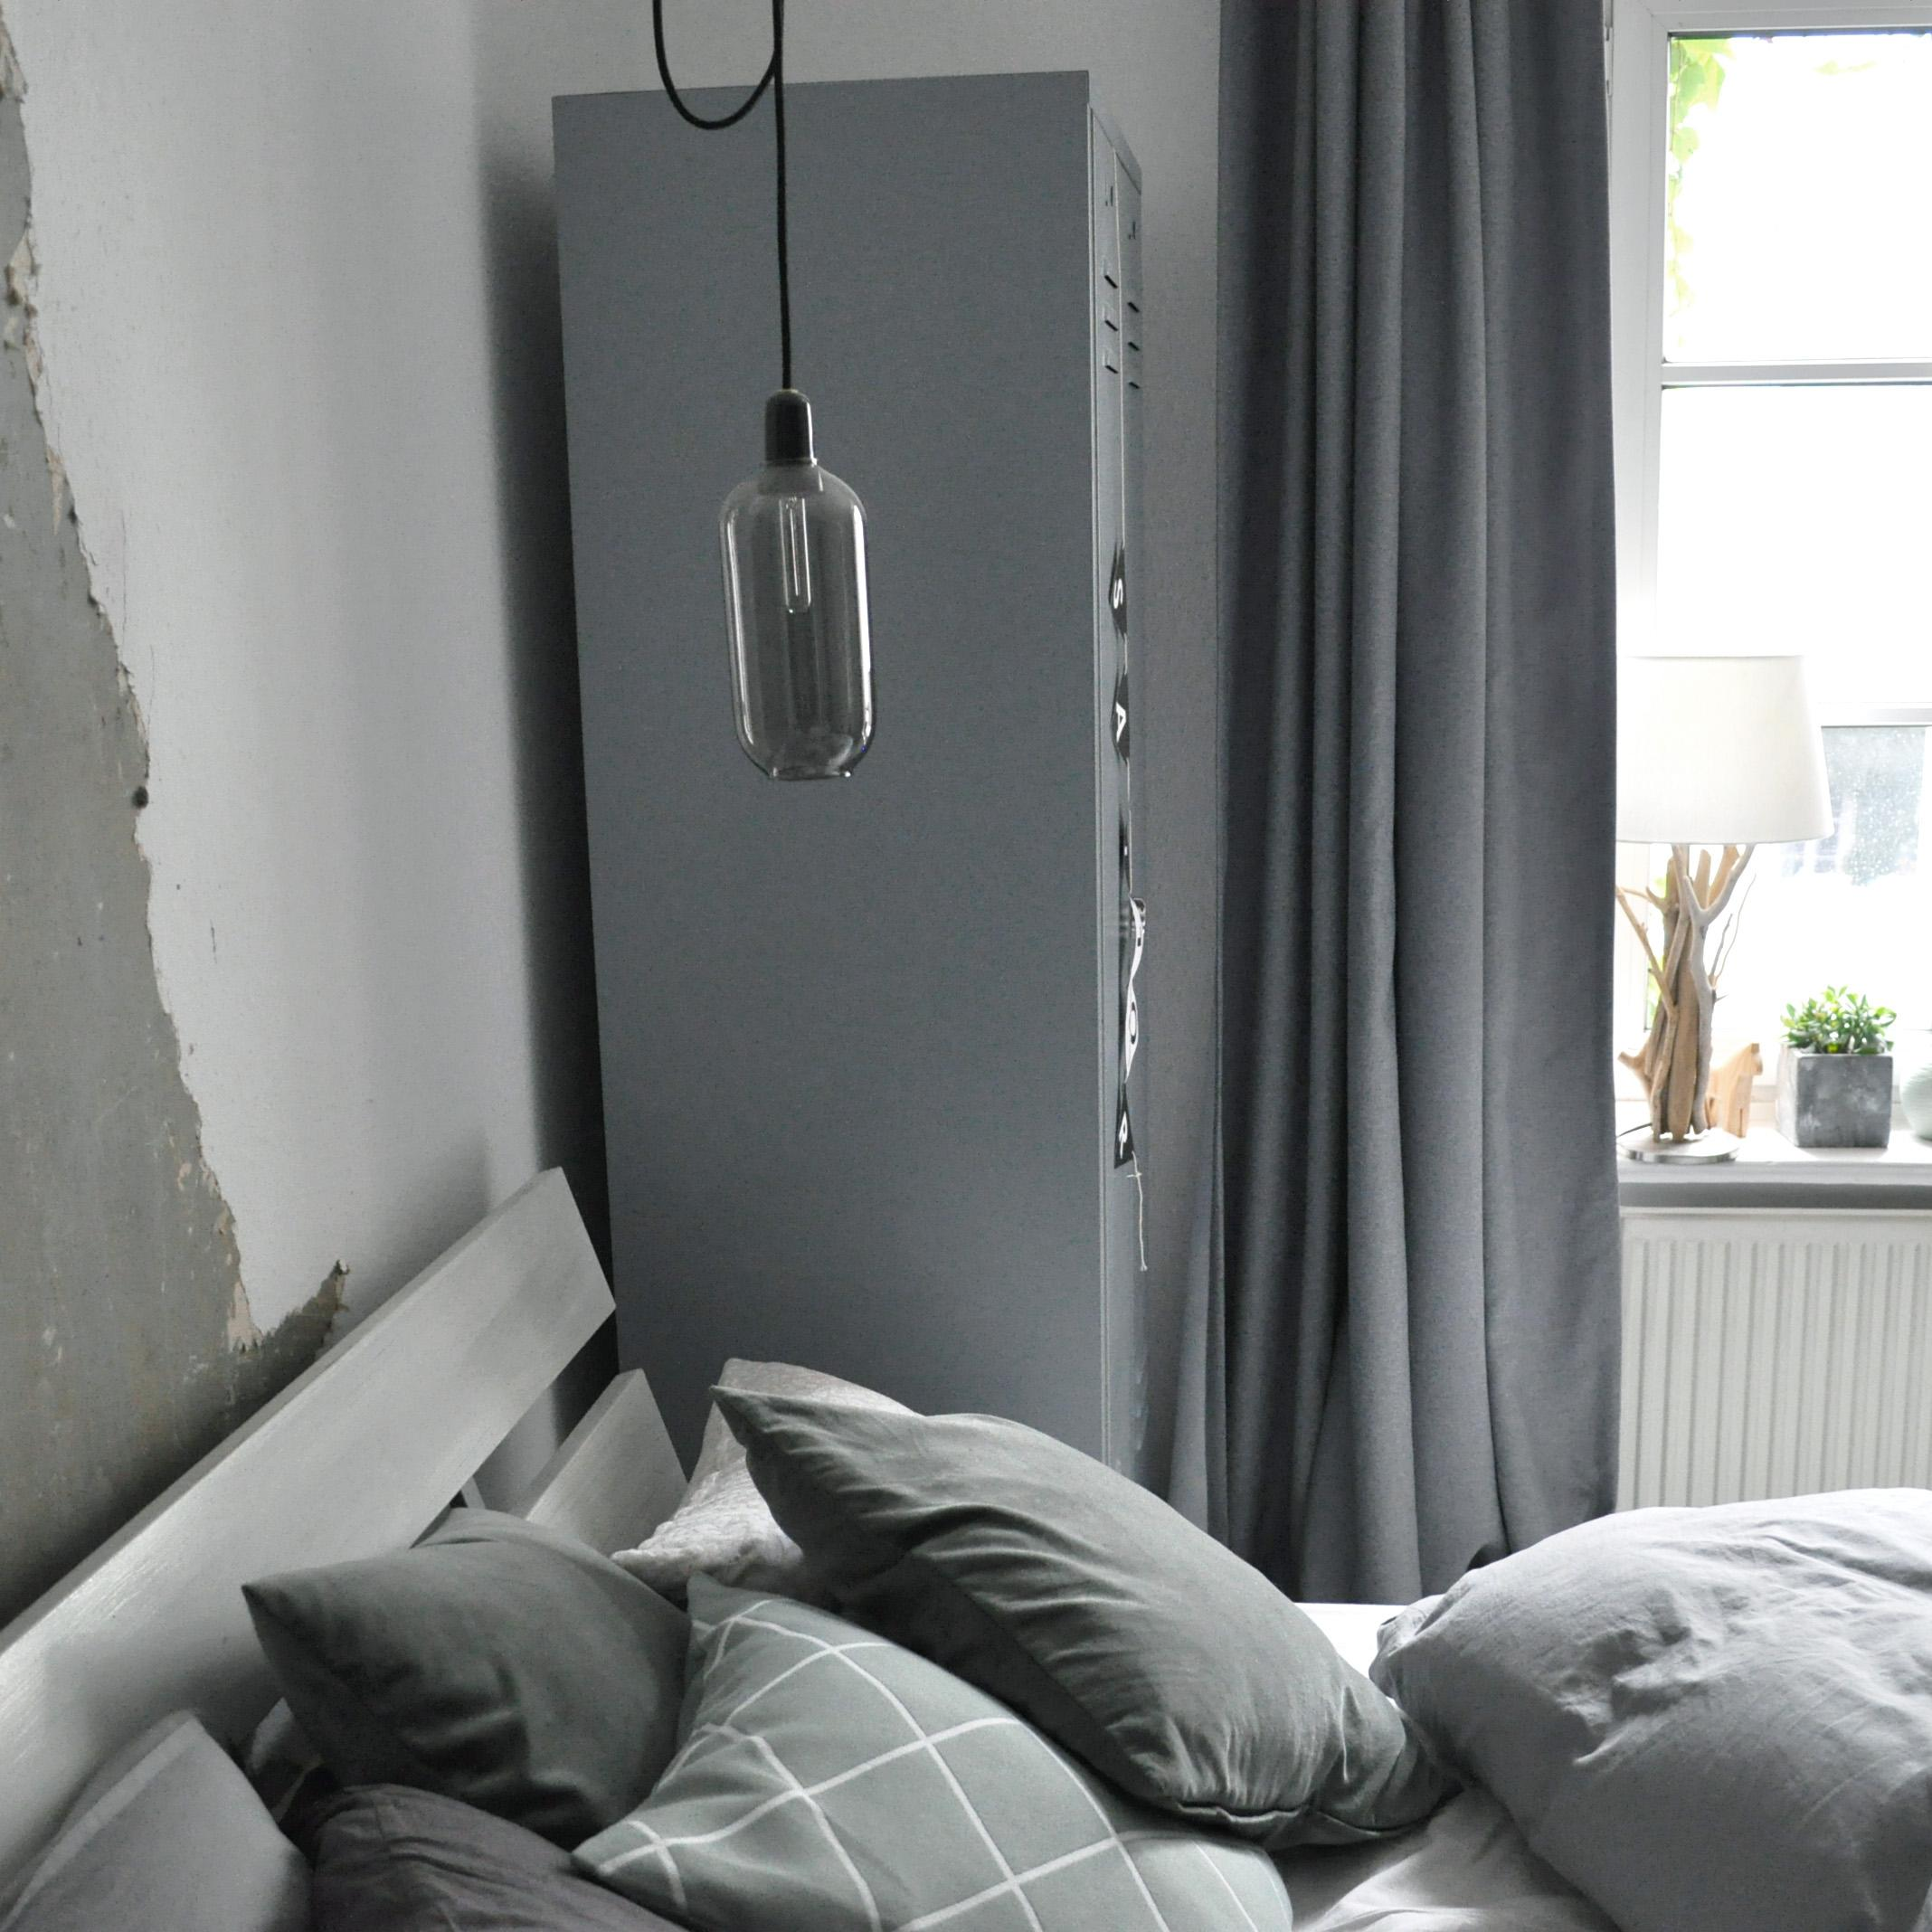 #lampe #schlafzimmer #grau #bett #kissen